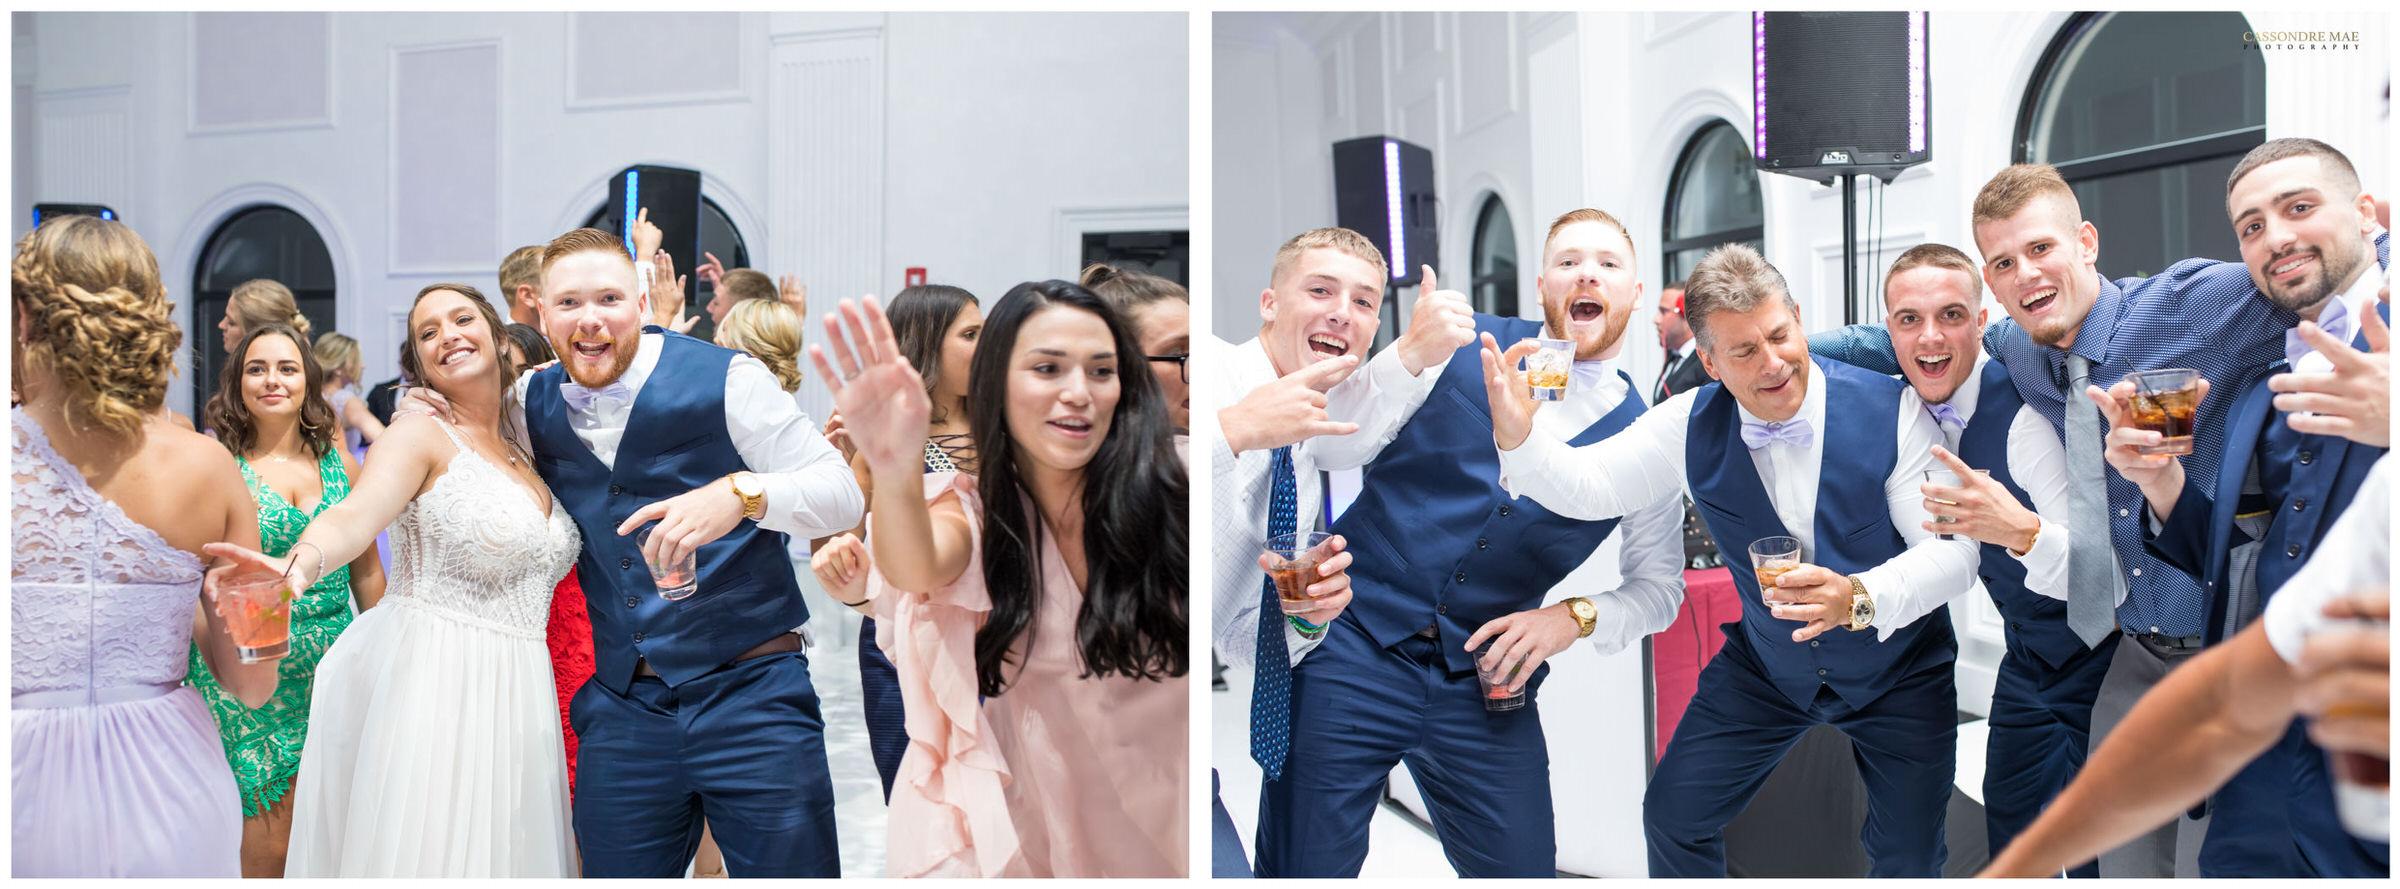 Cassondre Mae Photography Villa Venezia Wedding Photographer 42.jpg